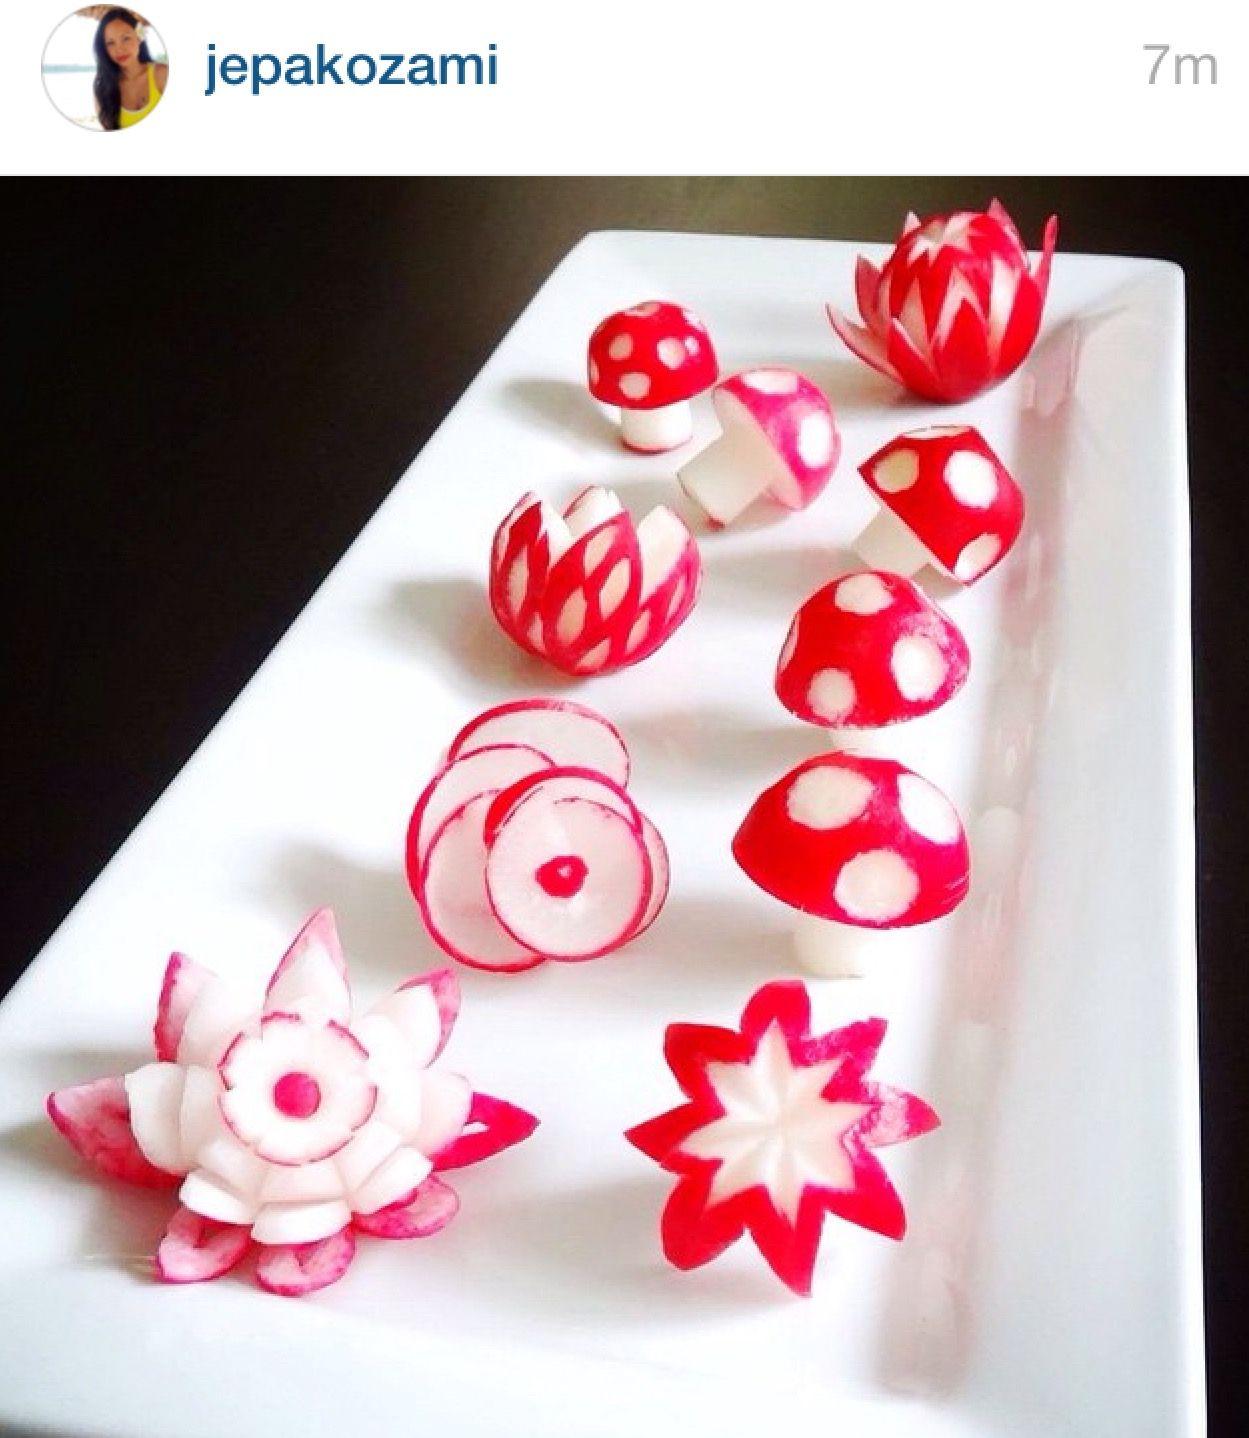 Radish carving garnish pinterest carving food art and food